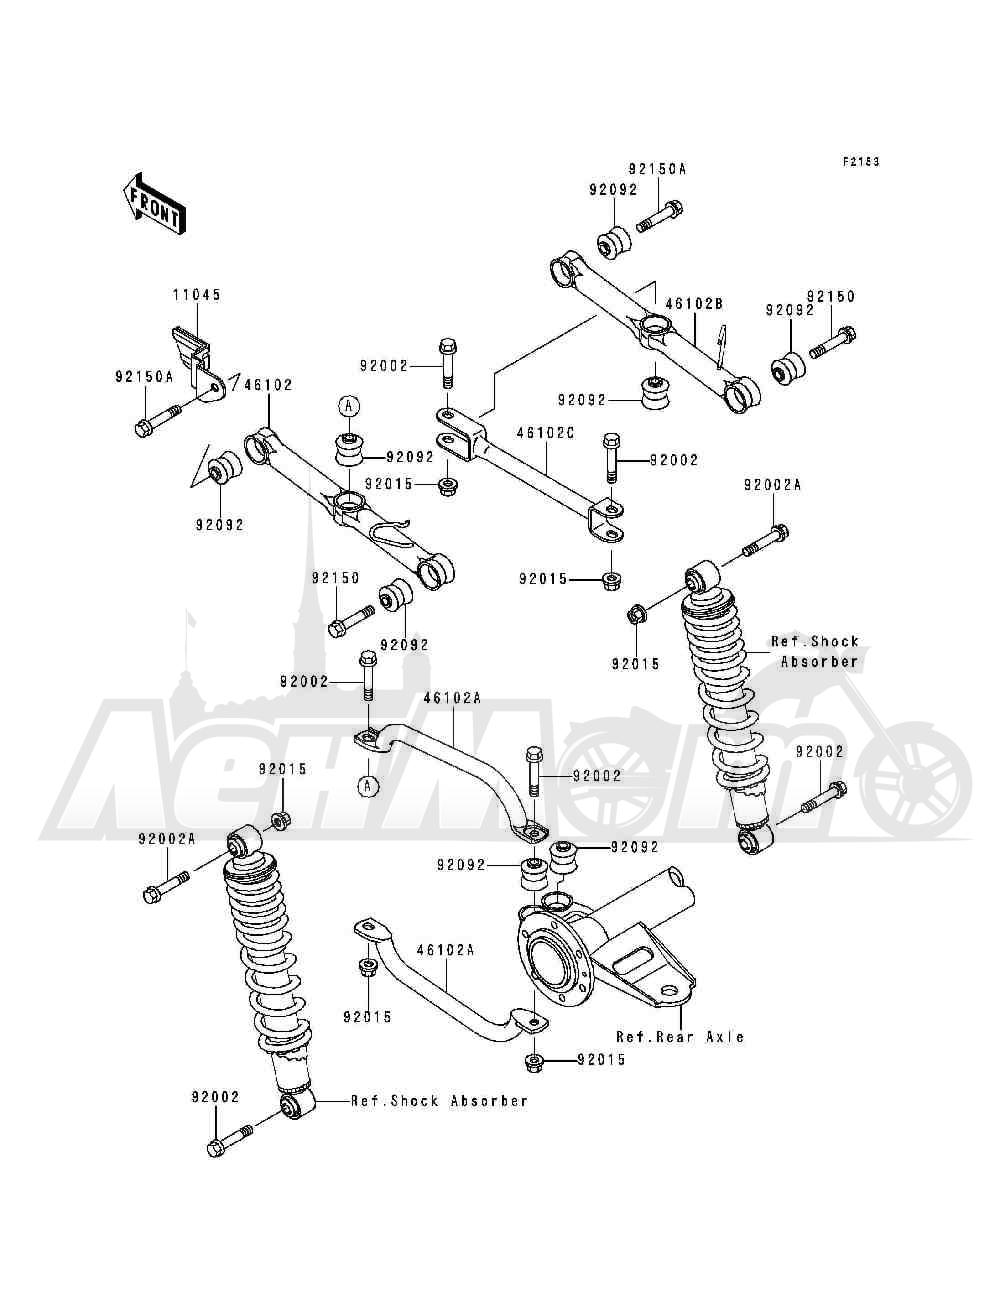 Запчасти для Квадроцикла Kawasaki 1993 BAYOU 300 (KLF300-B6) Раздел: REAR SUSPENSION | задняя подвеска